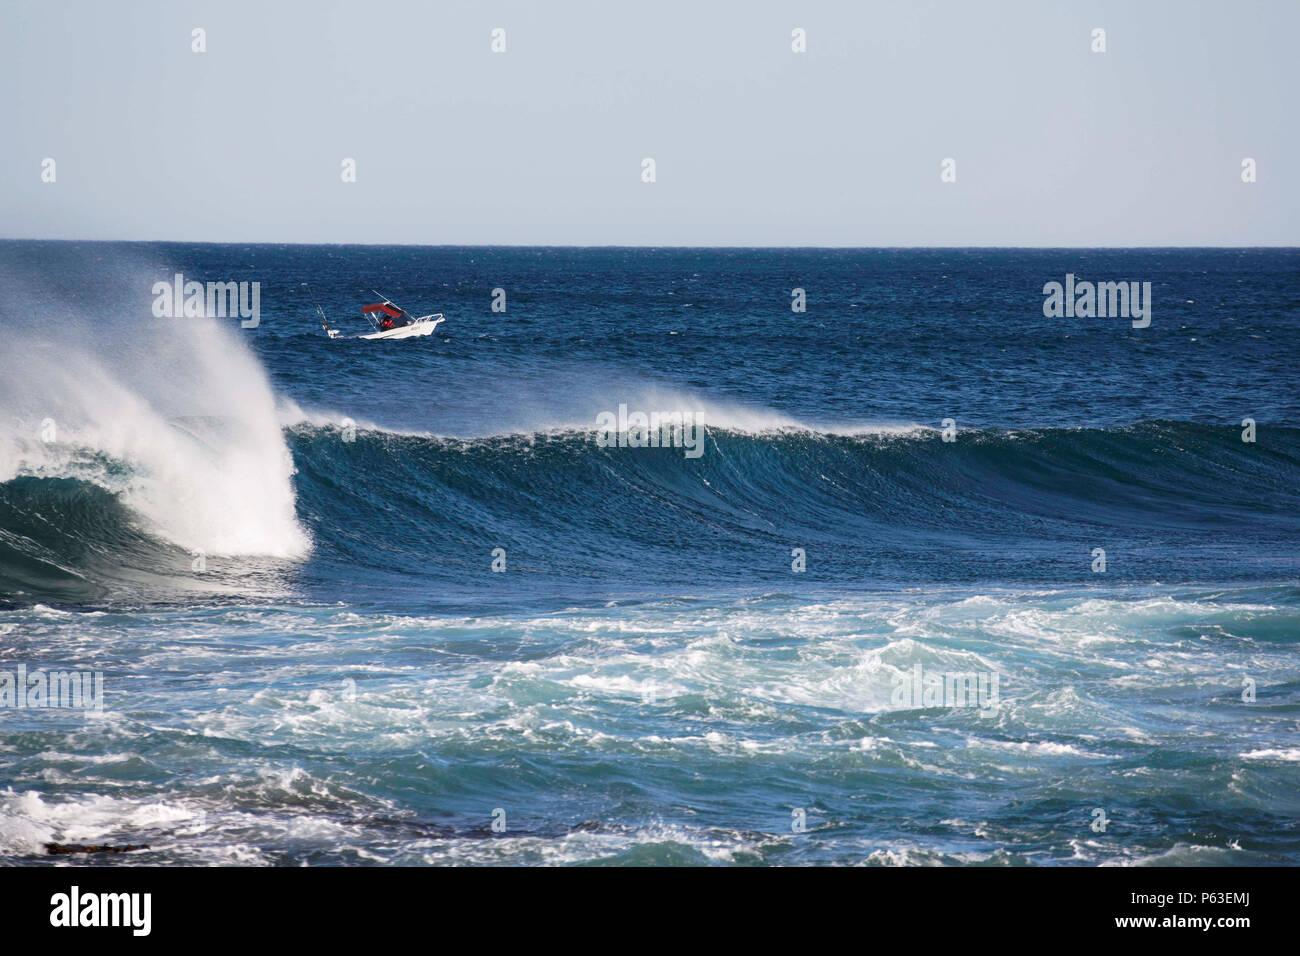 Small power boat and large breaking wave, Kalbarri  Western Australia - Stock Image